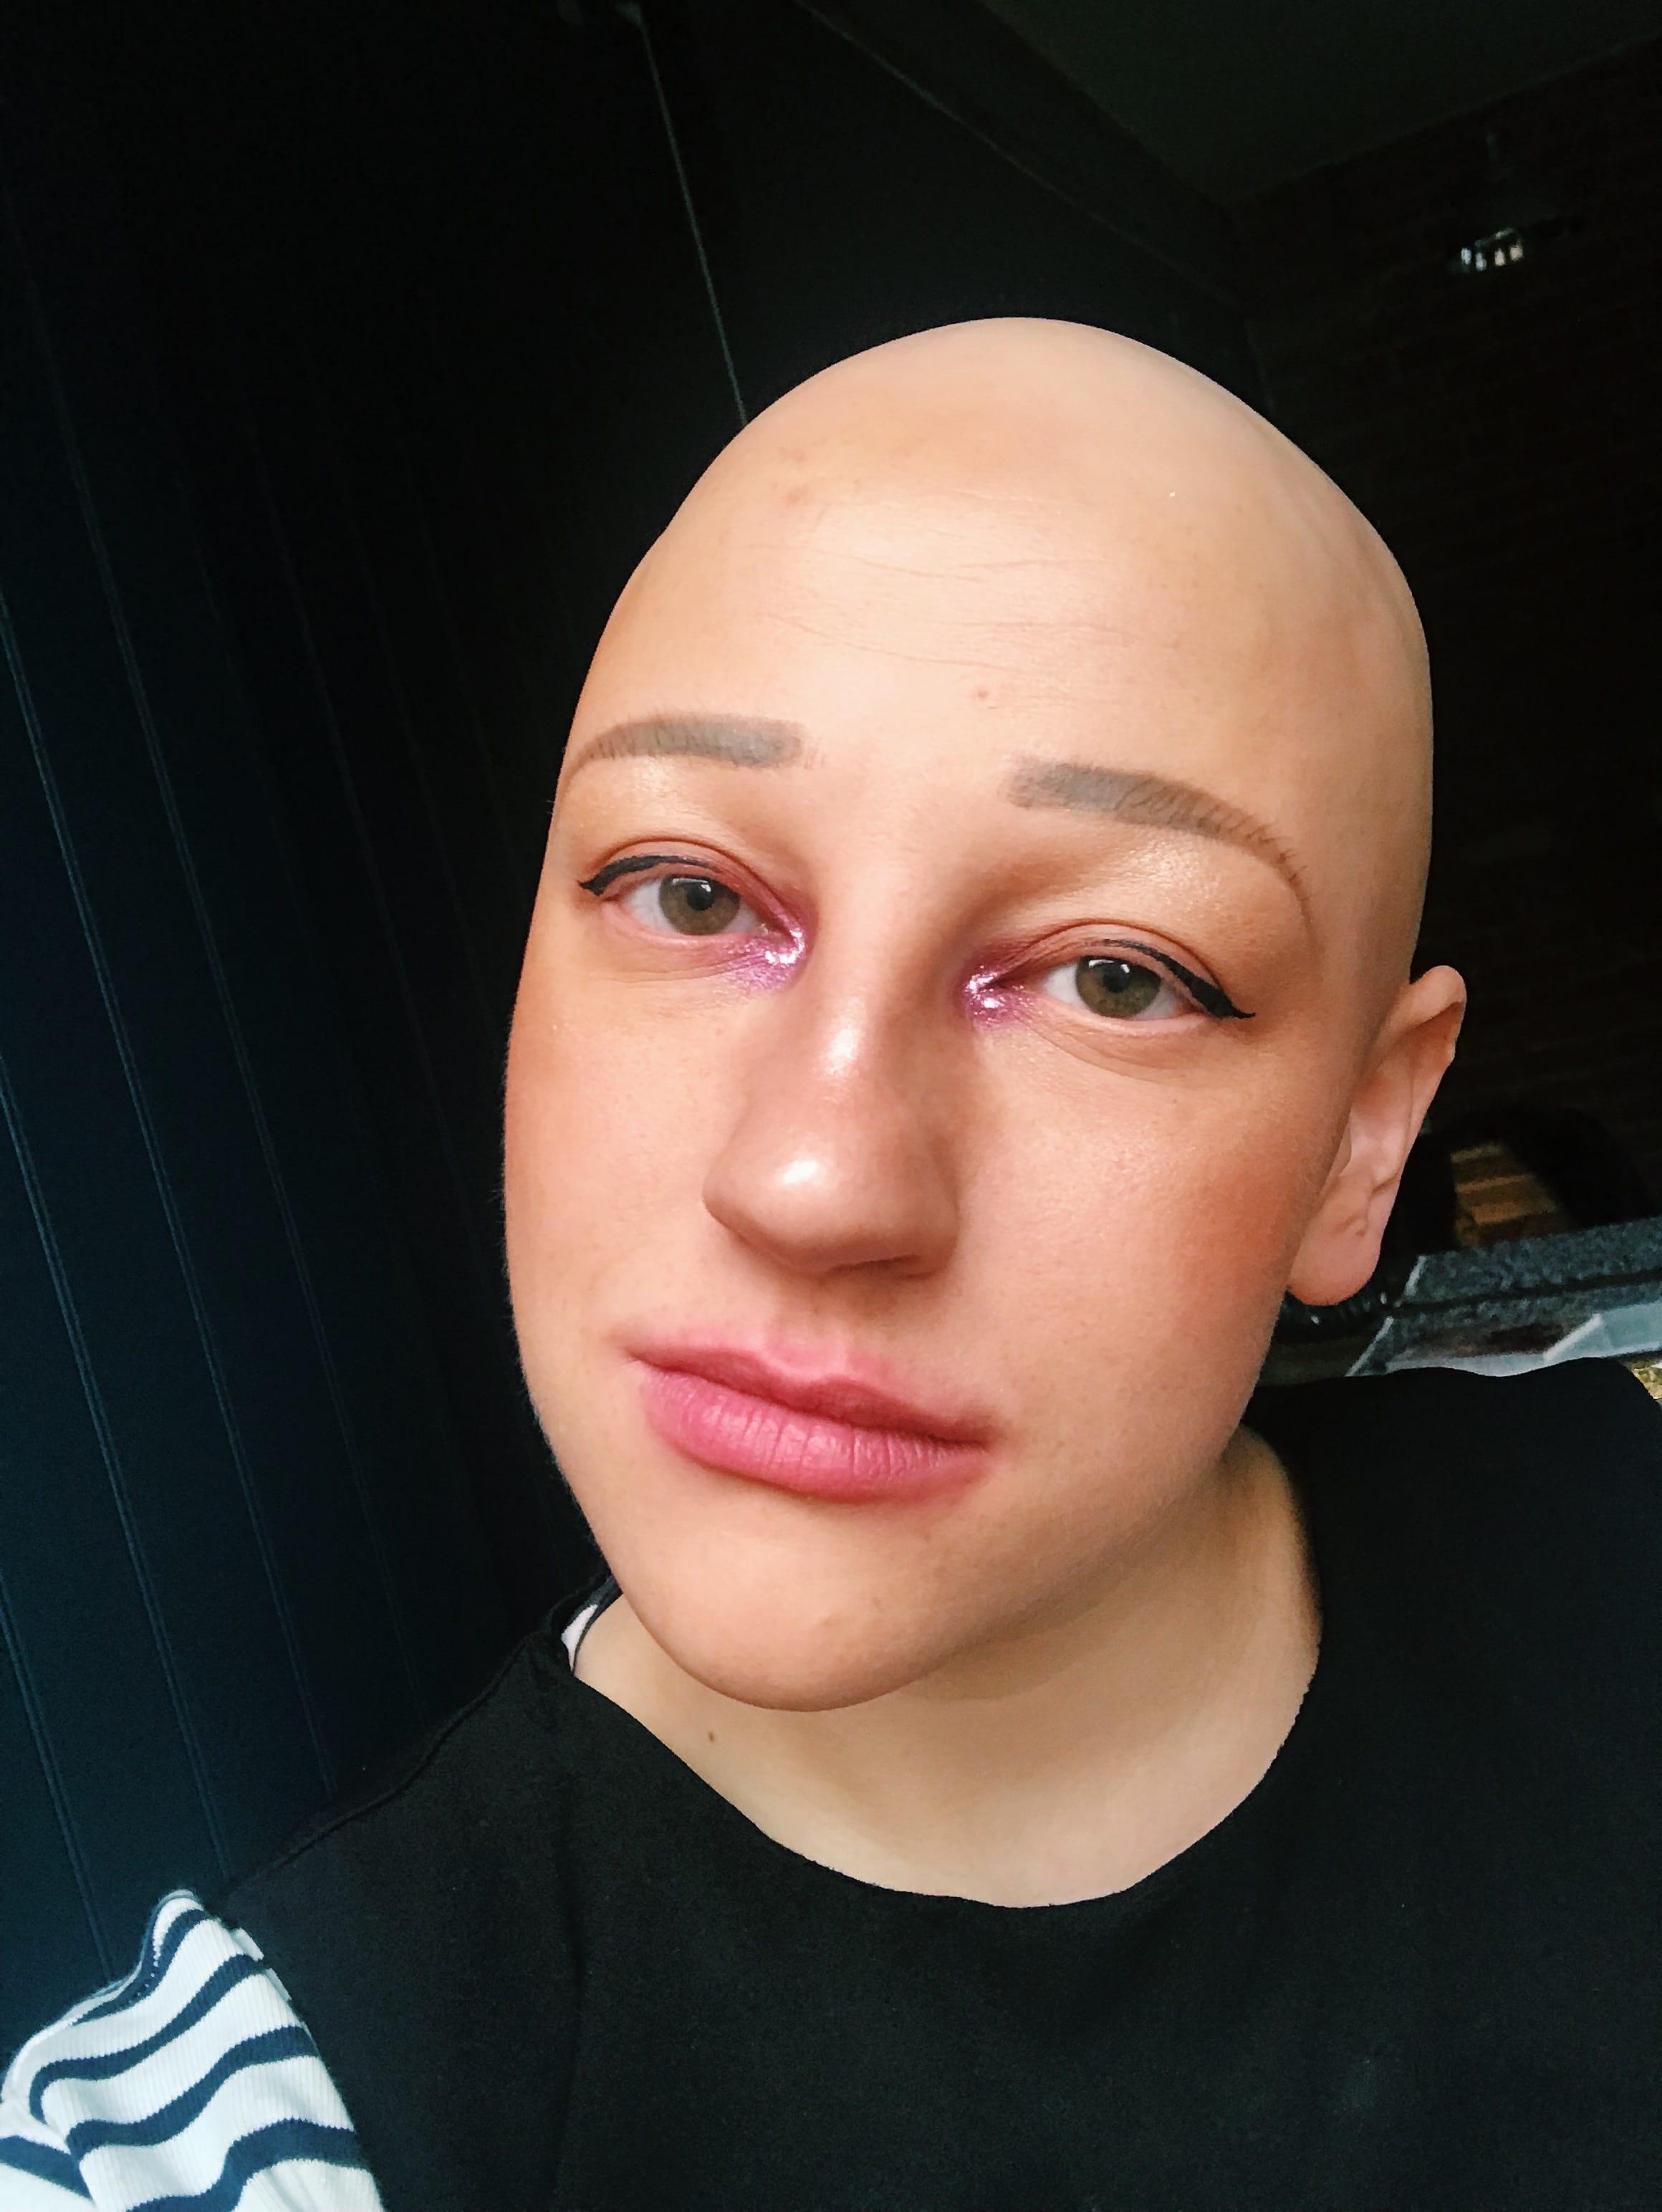 Richard Malone LFW Makeup | HQhair Blog